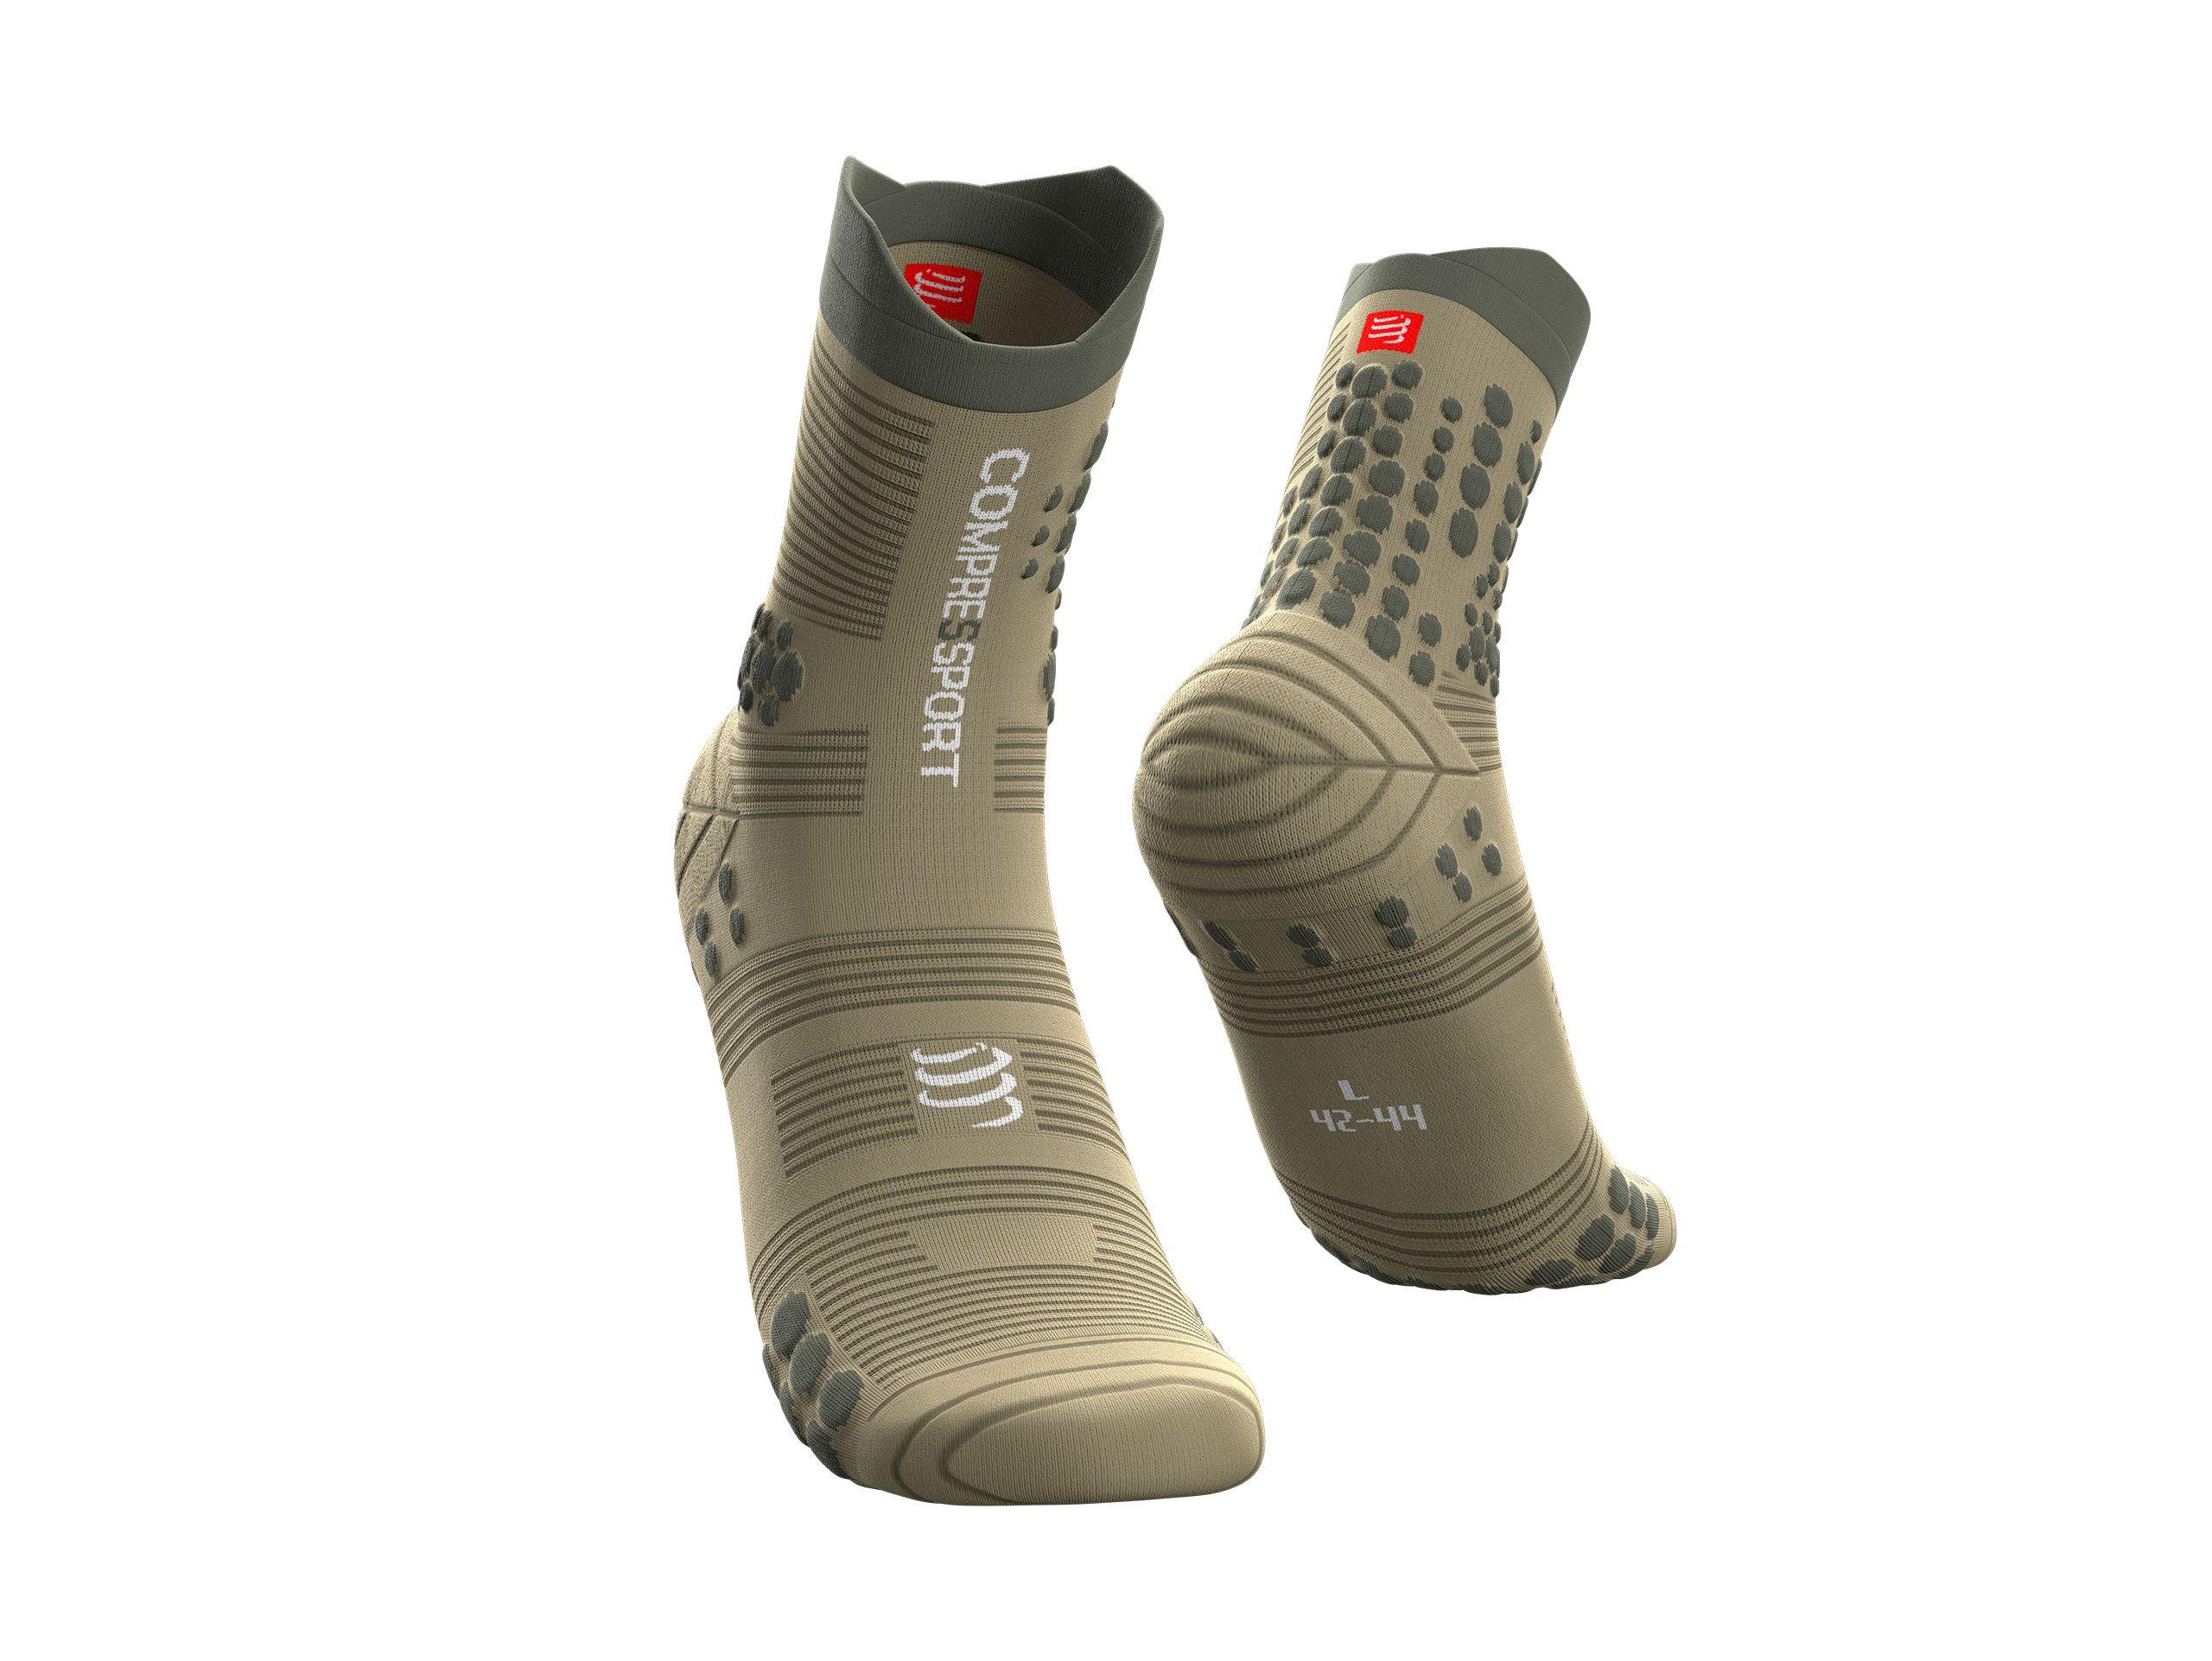 Pro Racing Socks v3.0 Trail - Dusty Olive